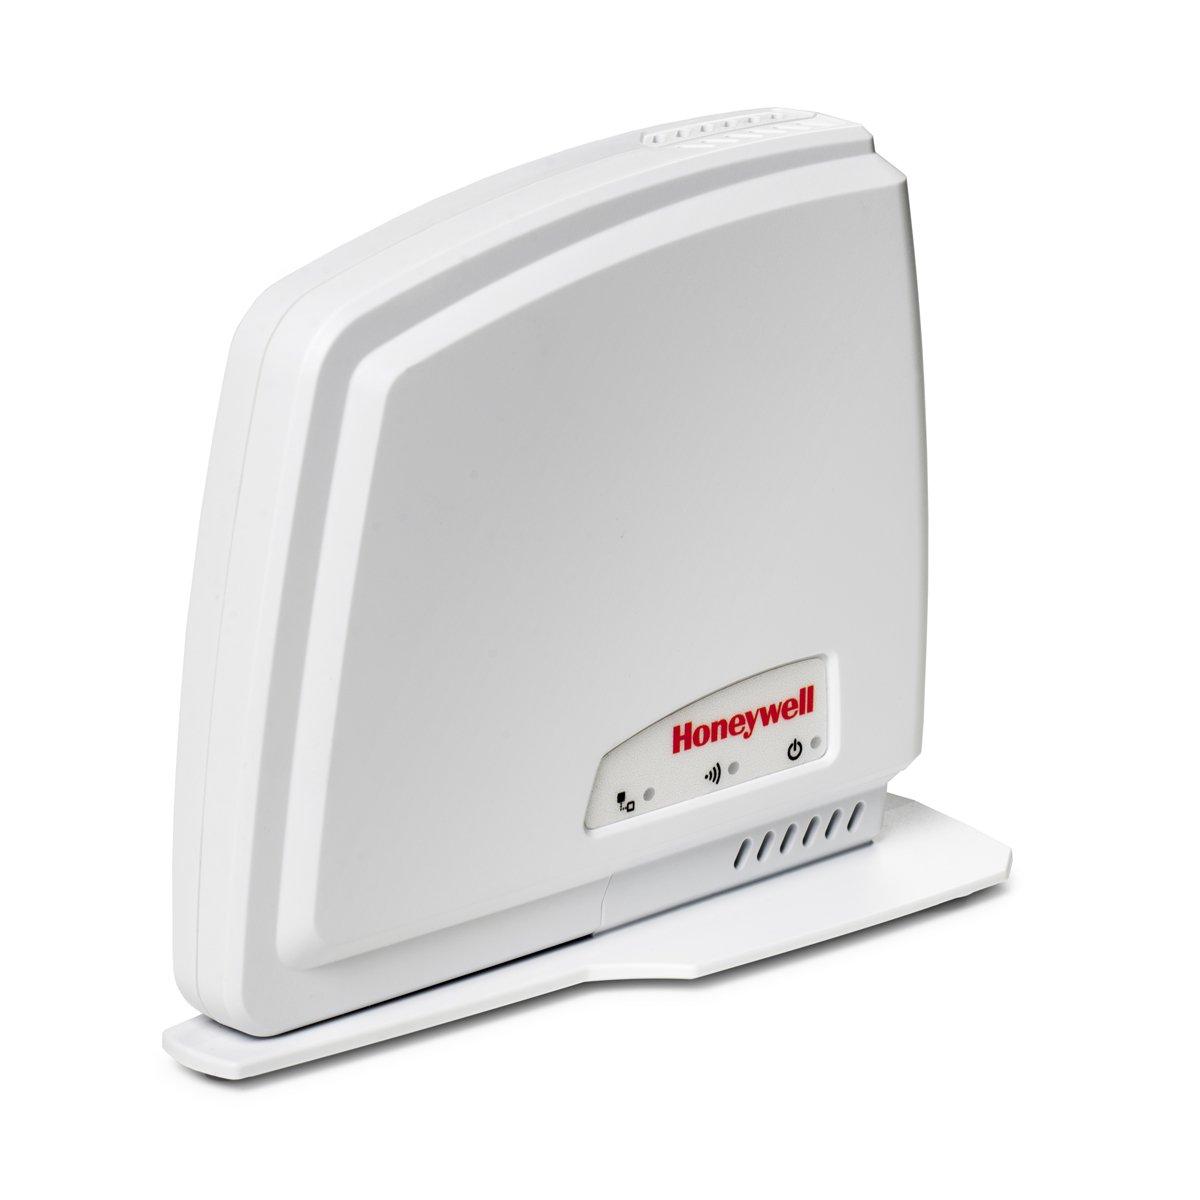 Honeywell RFG100 Pasarela de Internet, para Manejar el Sistema Evohome Via App, Blanco, 212 X 140 X 96: Amazon.es: Hogar